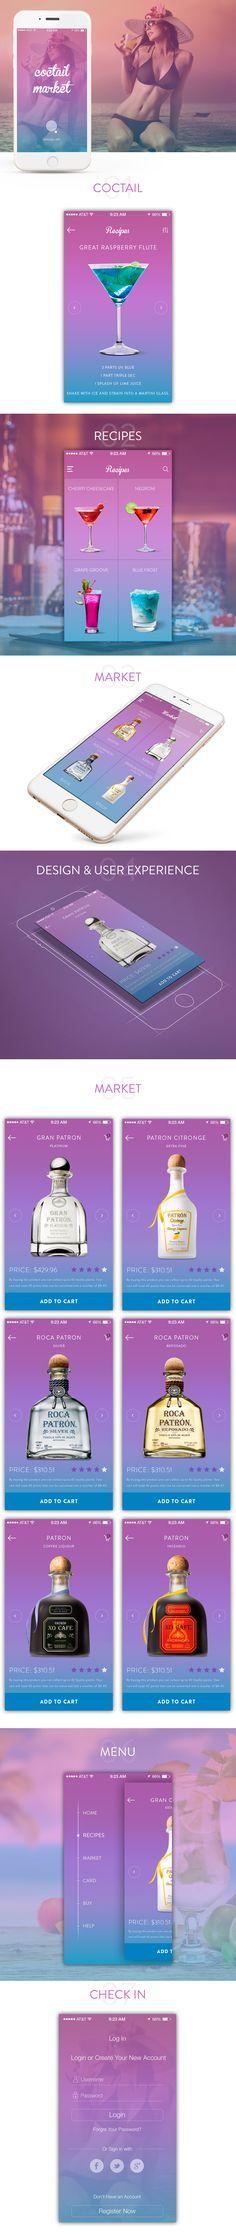 coctail market   Mobile App UX/UI Design - FREE PSD on Behance